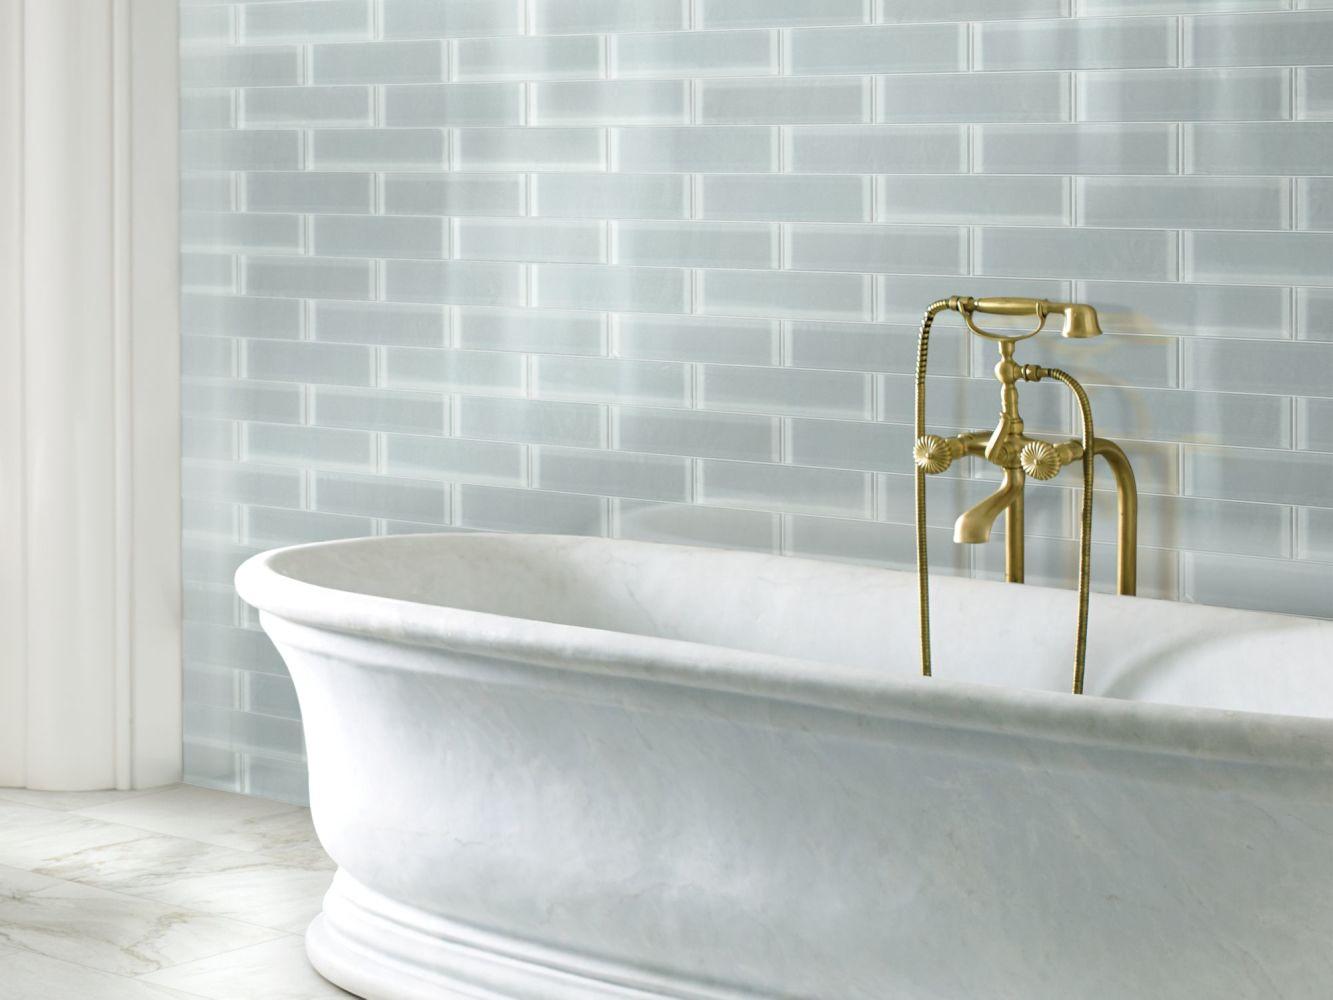 Shaw Floors Home Fn Gold Ceramic Principal 3×12 Glass Tile 2 Shadow 00550_TG74B